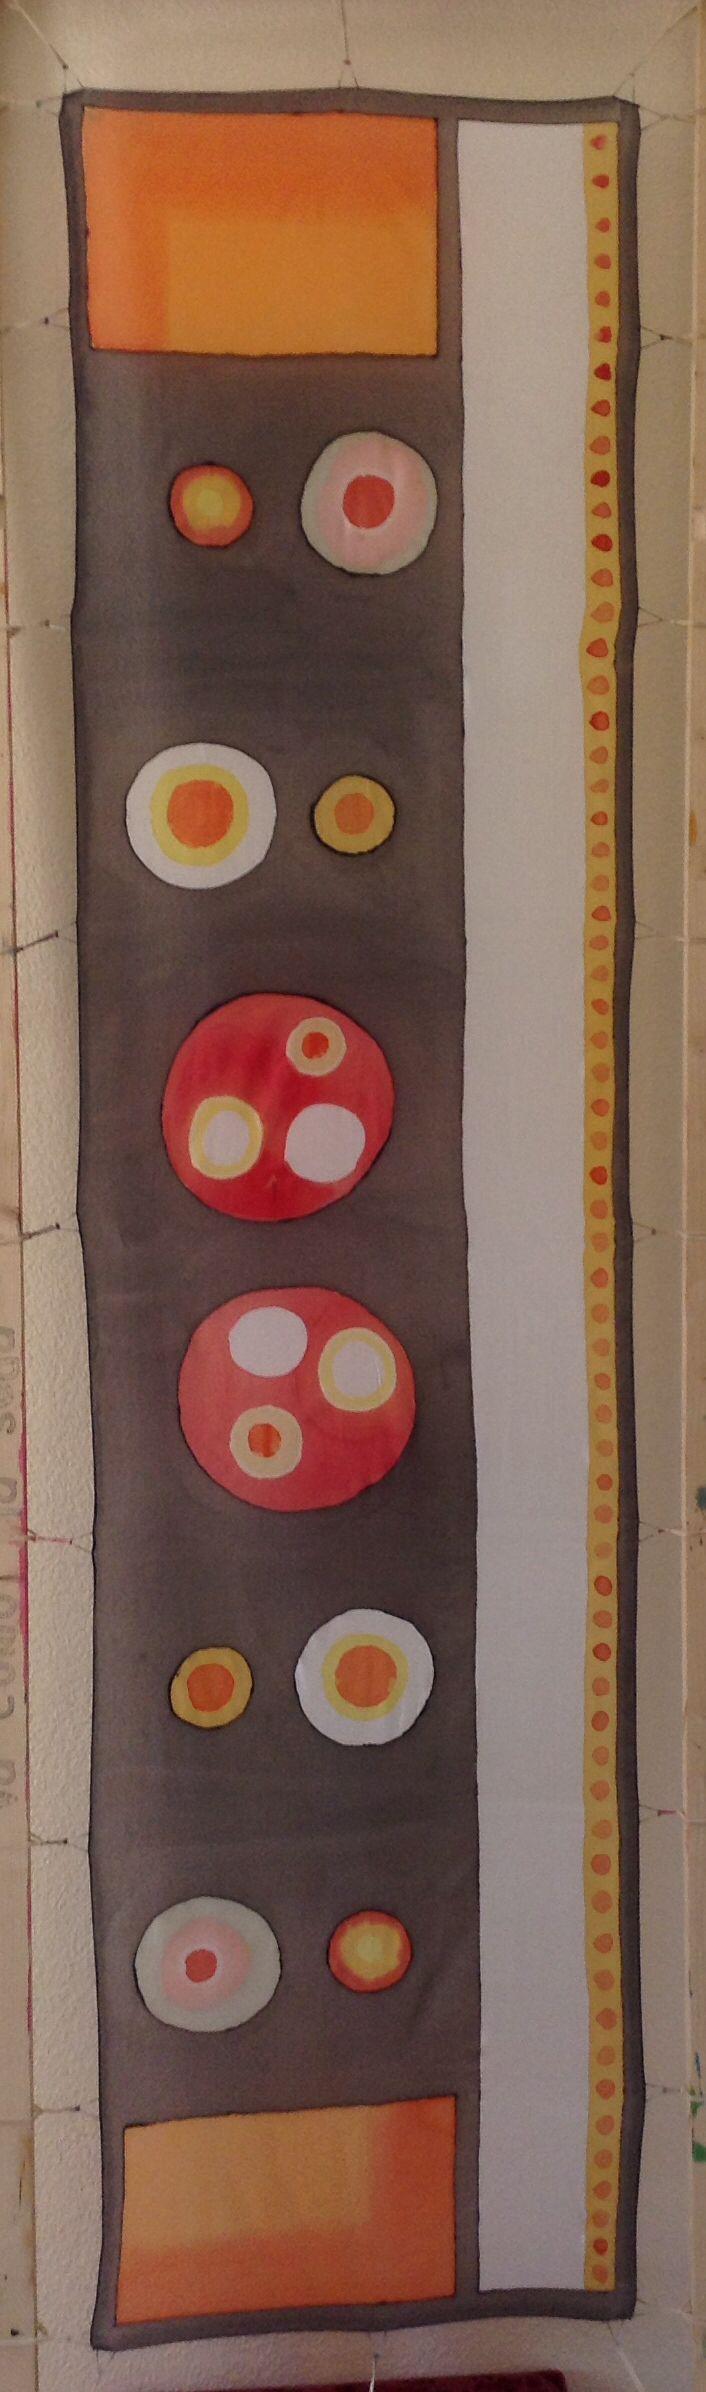 m s de 20 ideas incre bles sobre manzana roja en pinterest rojo caramelo rojo y manzana roja. Black Bedroom Furniture Sets. Home Design Ideas